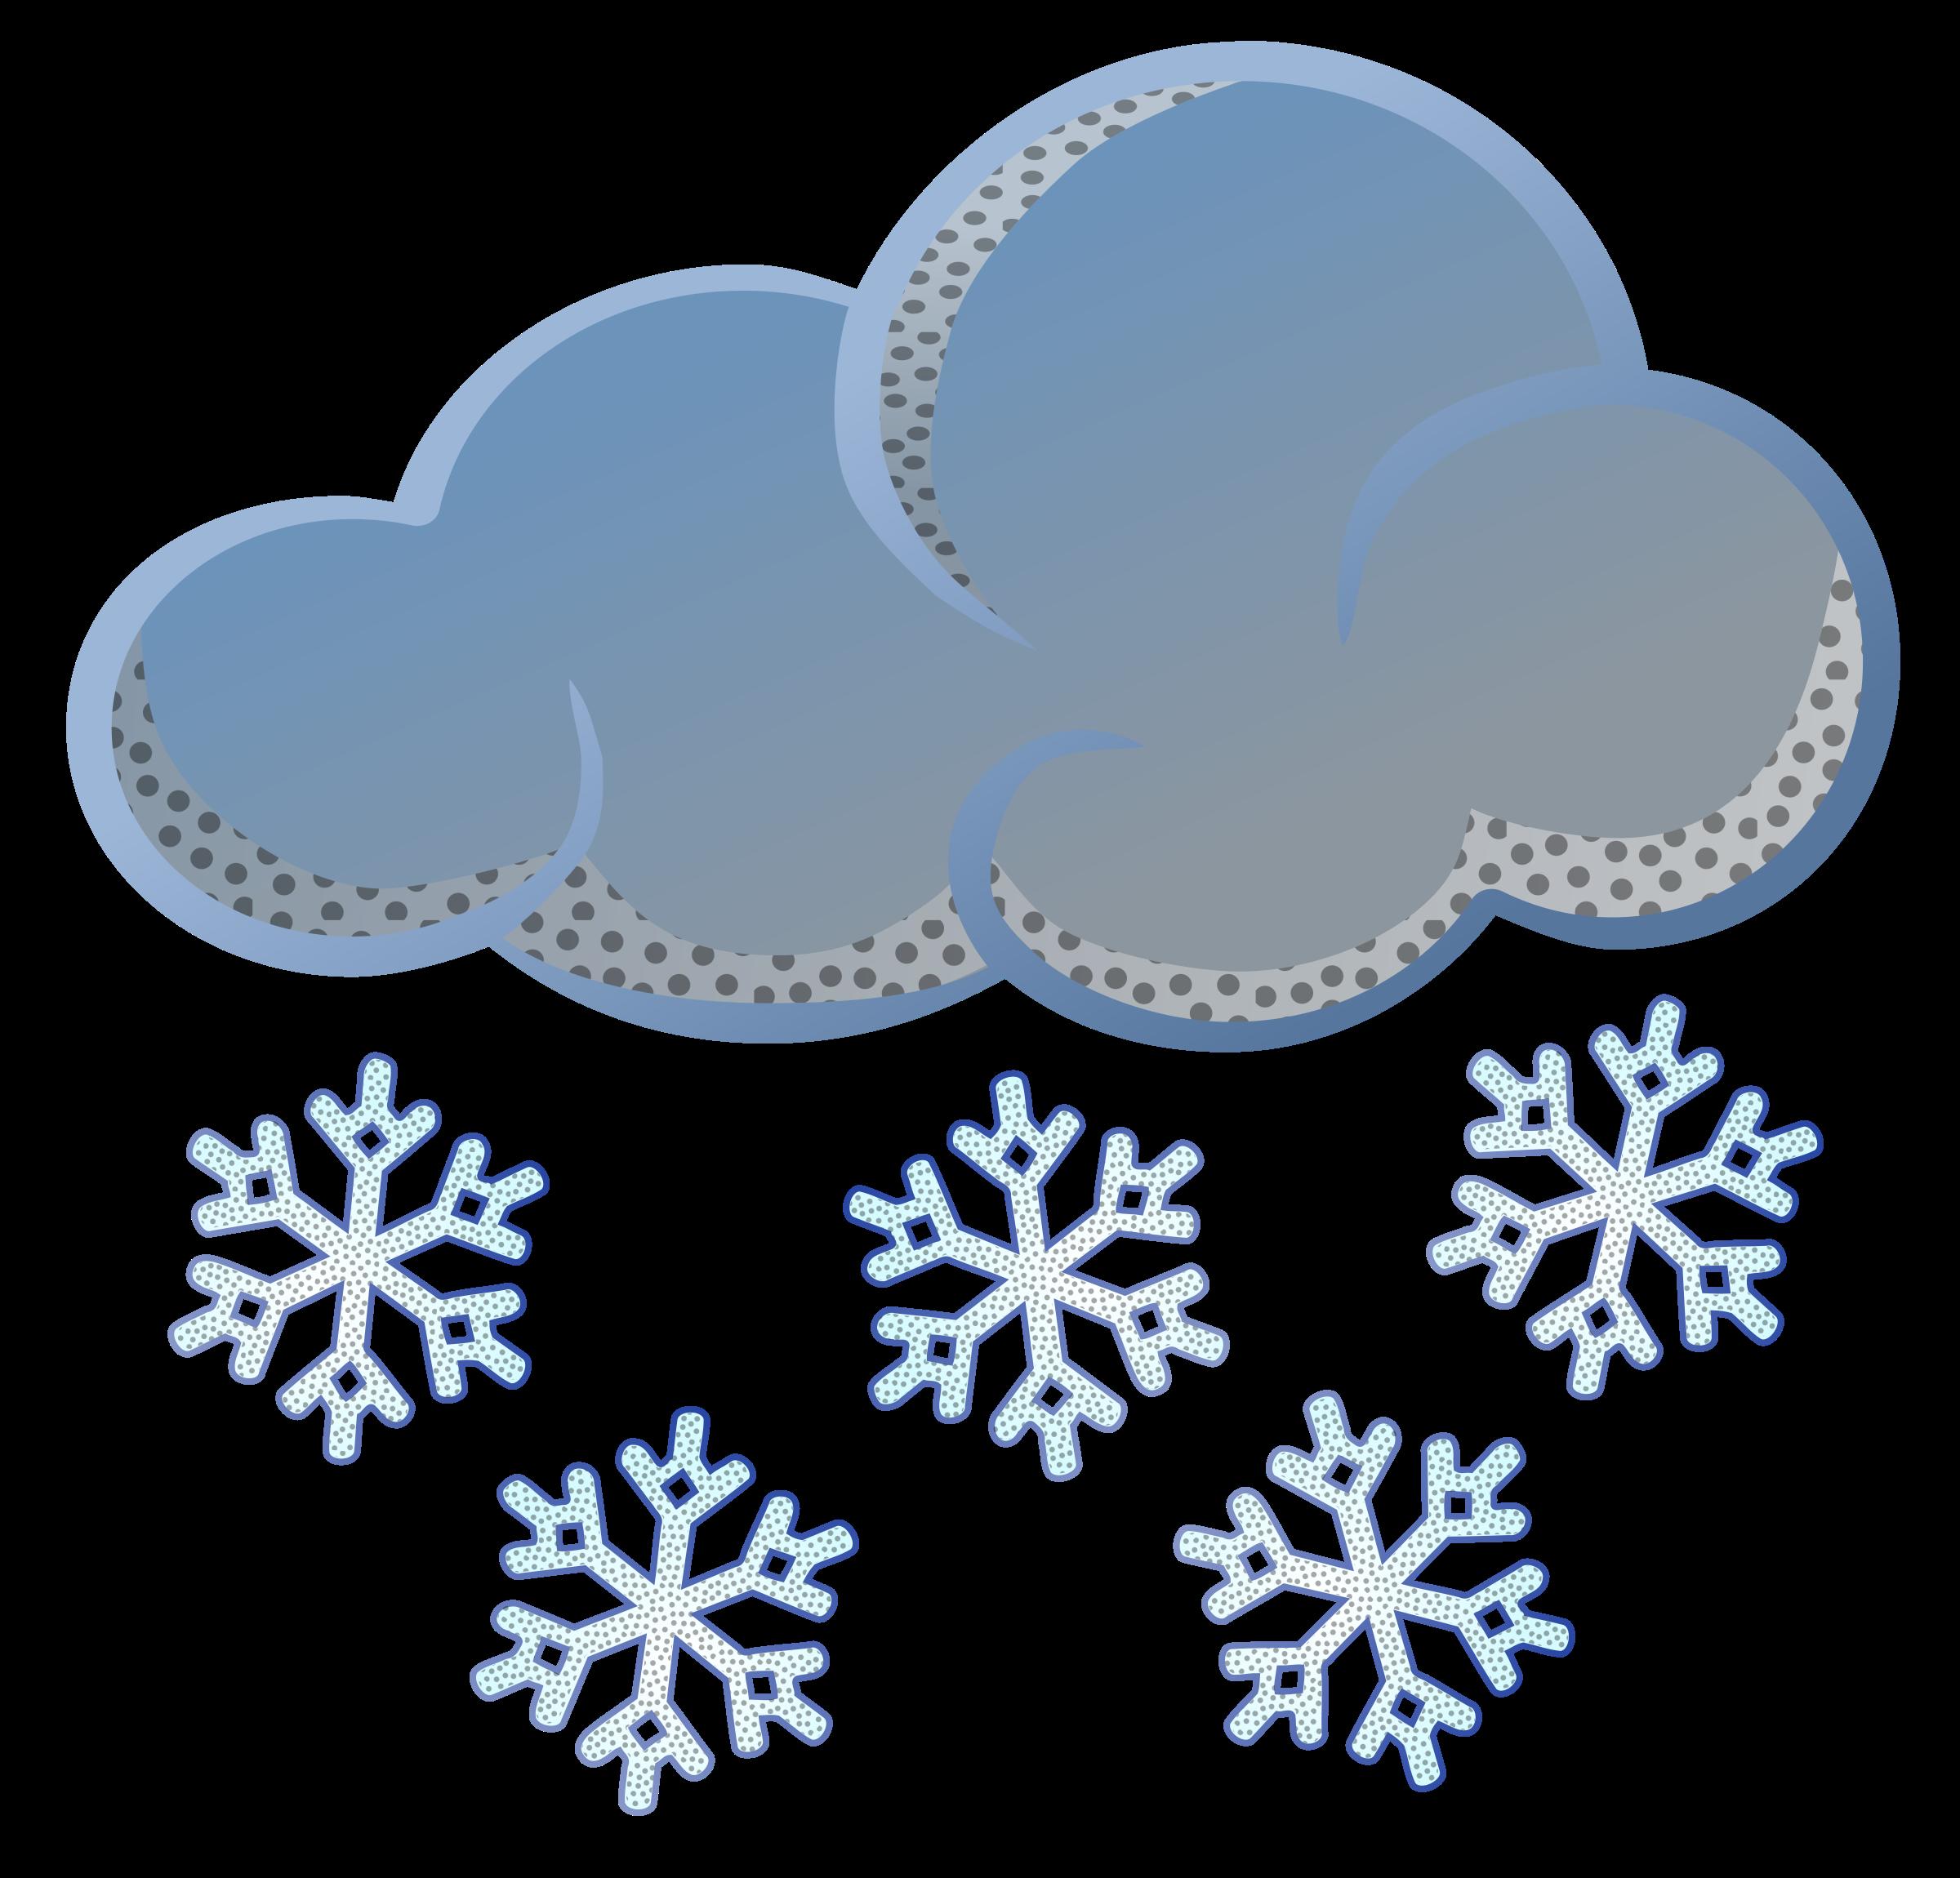 Snow coloured big image. Winter clipart rain